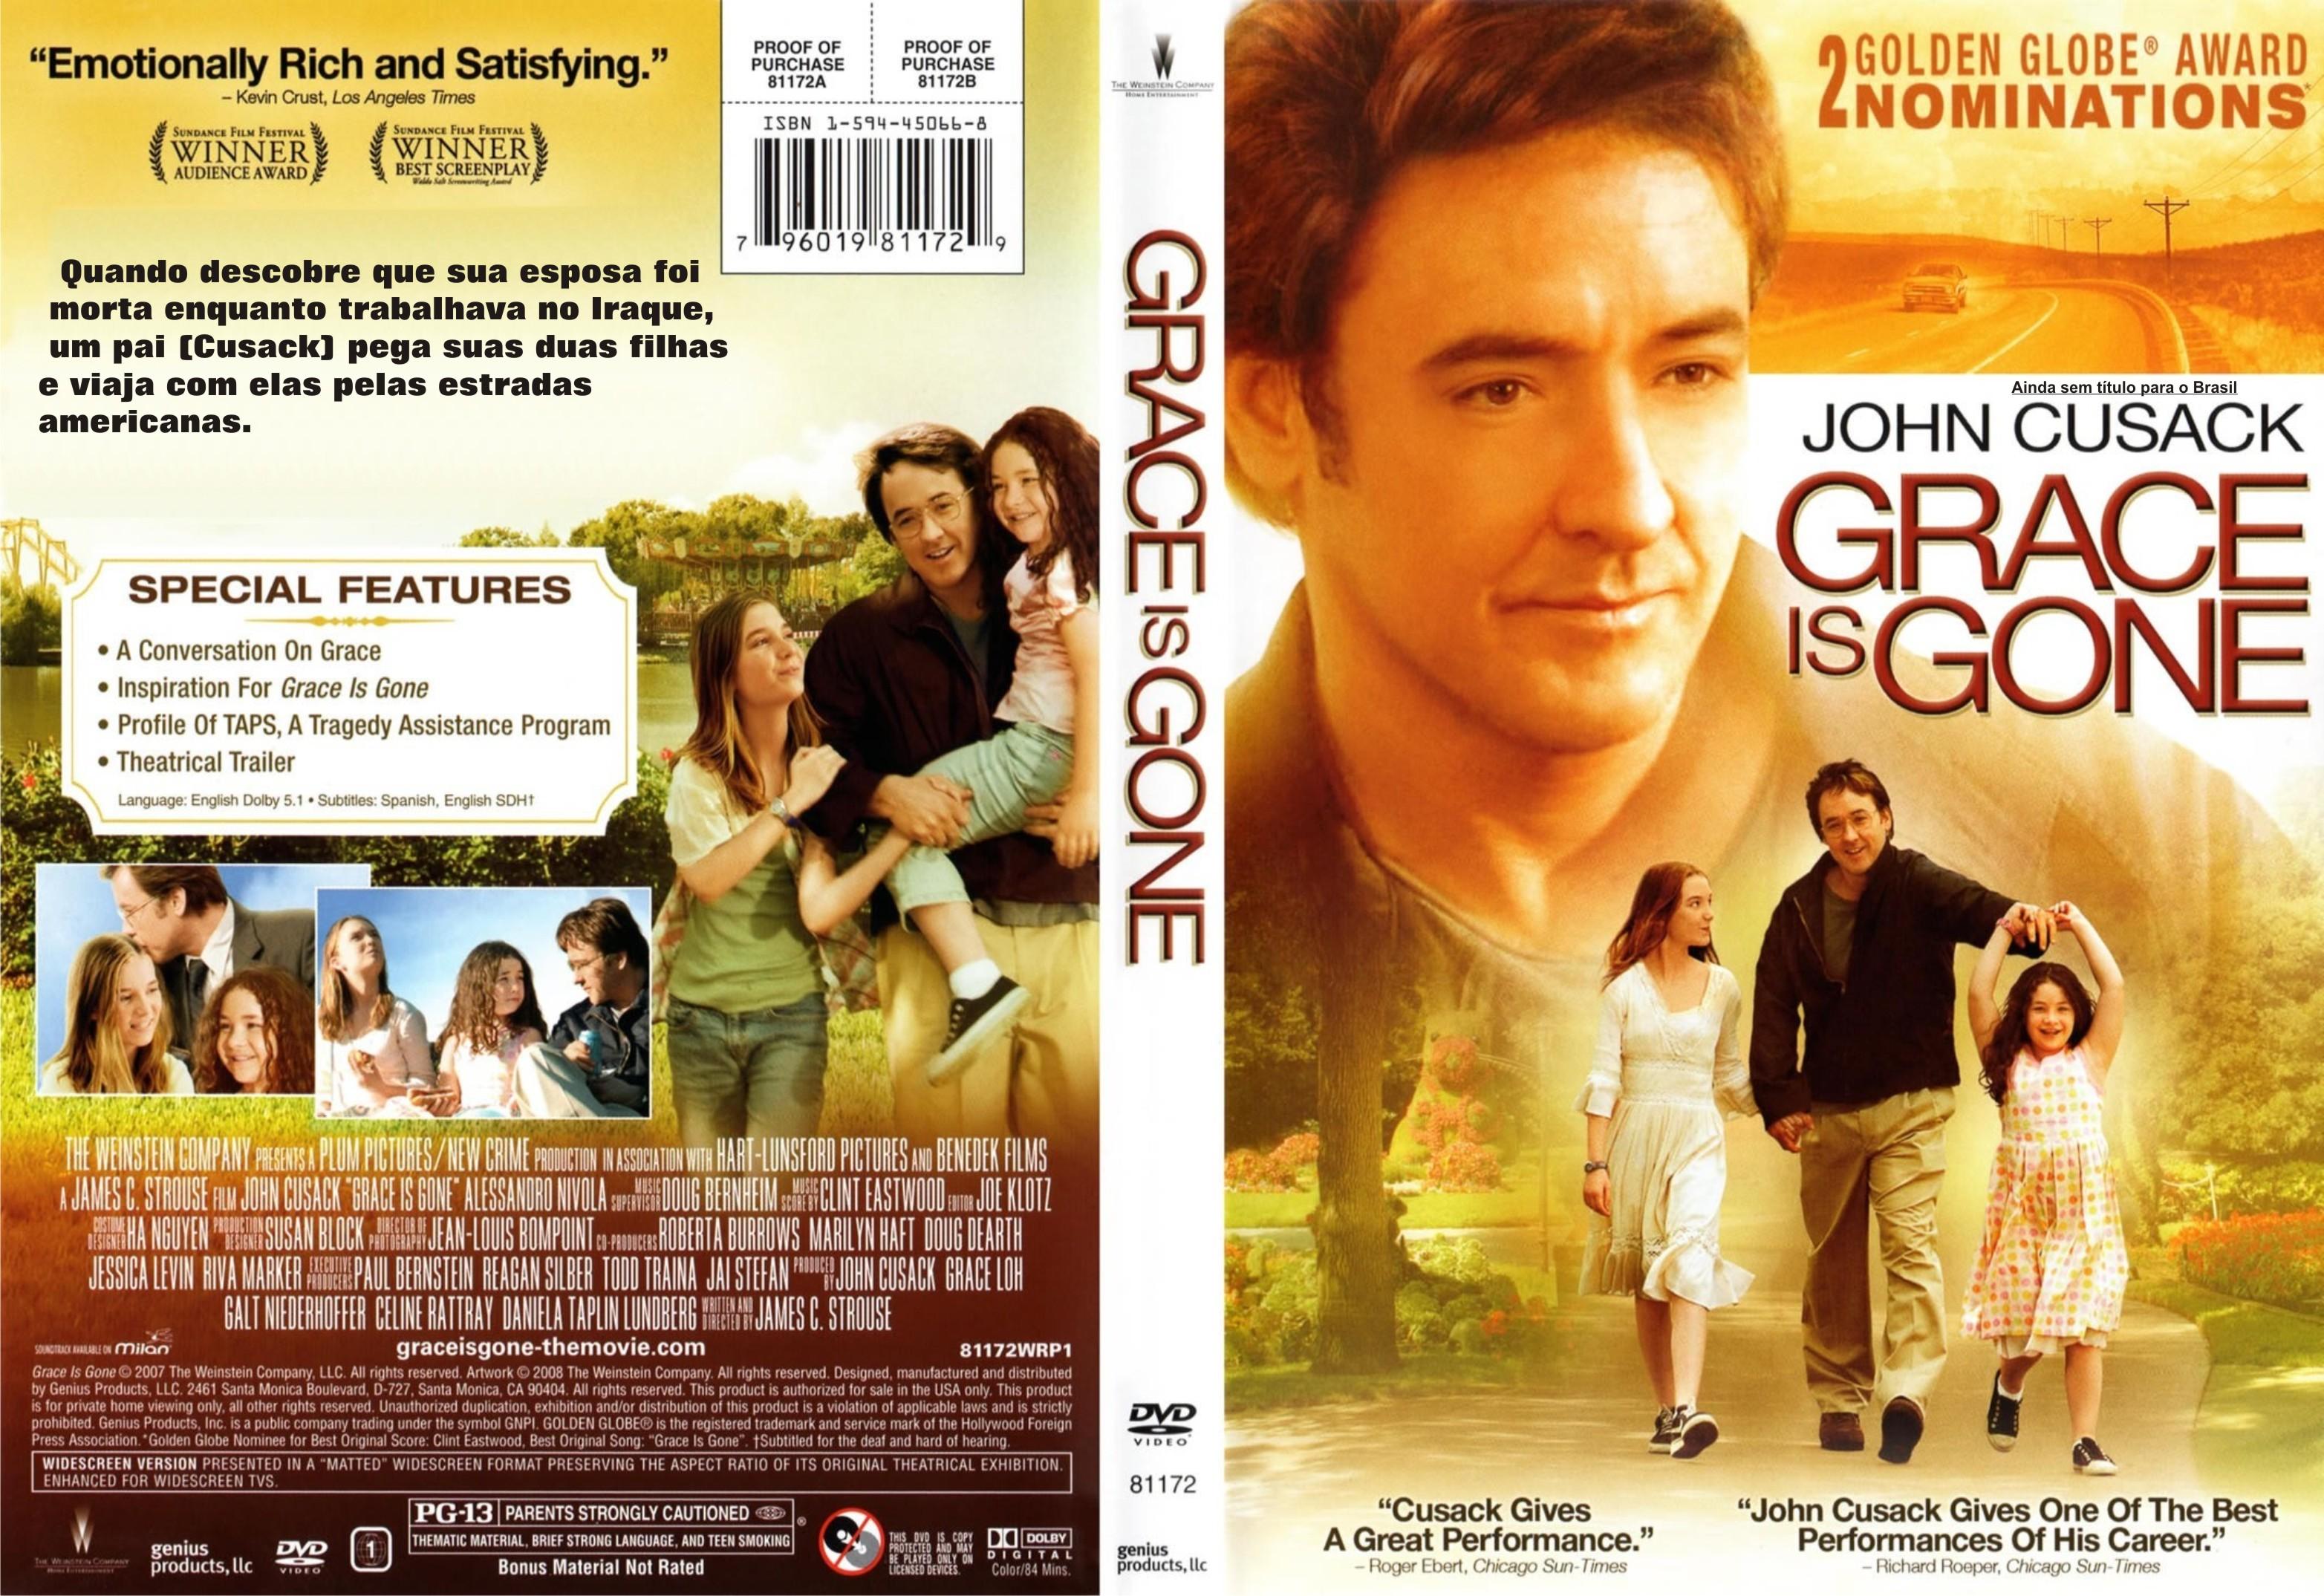 GraceIsGone